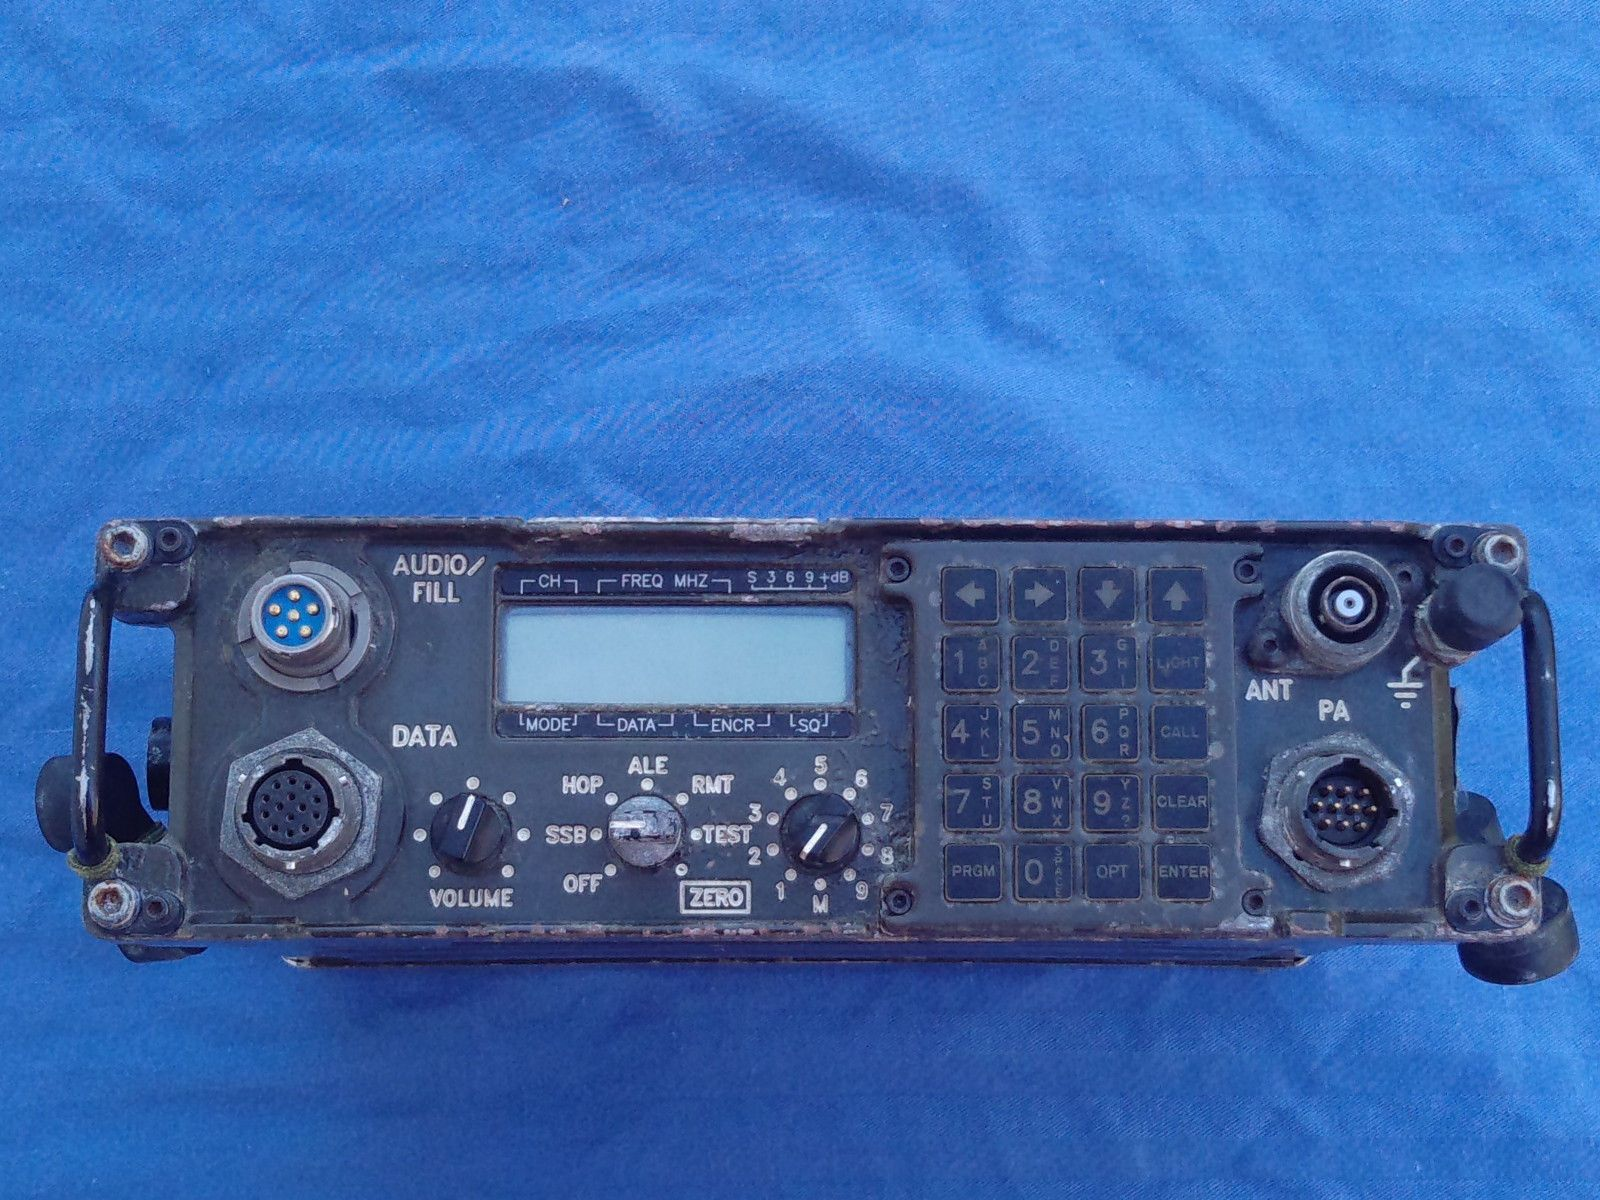 PRC 138 HF Manpack Radio RT 1694 Military Transciever | eBay